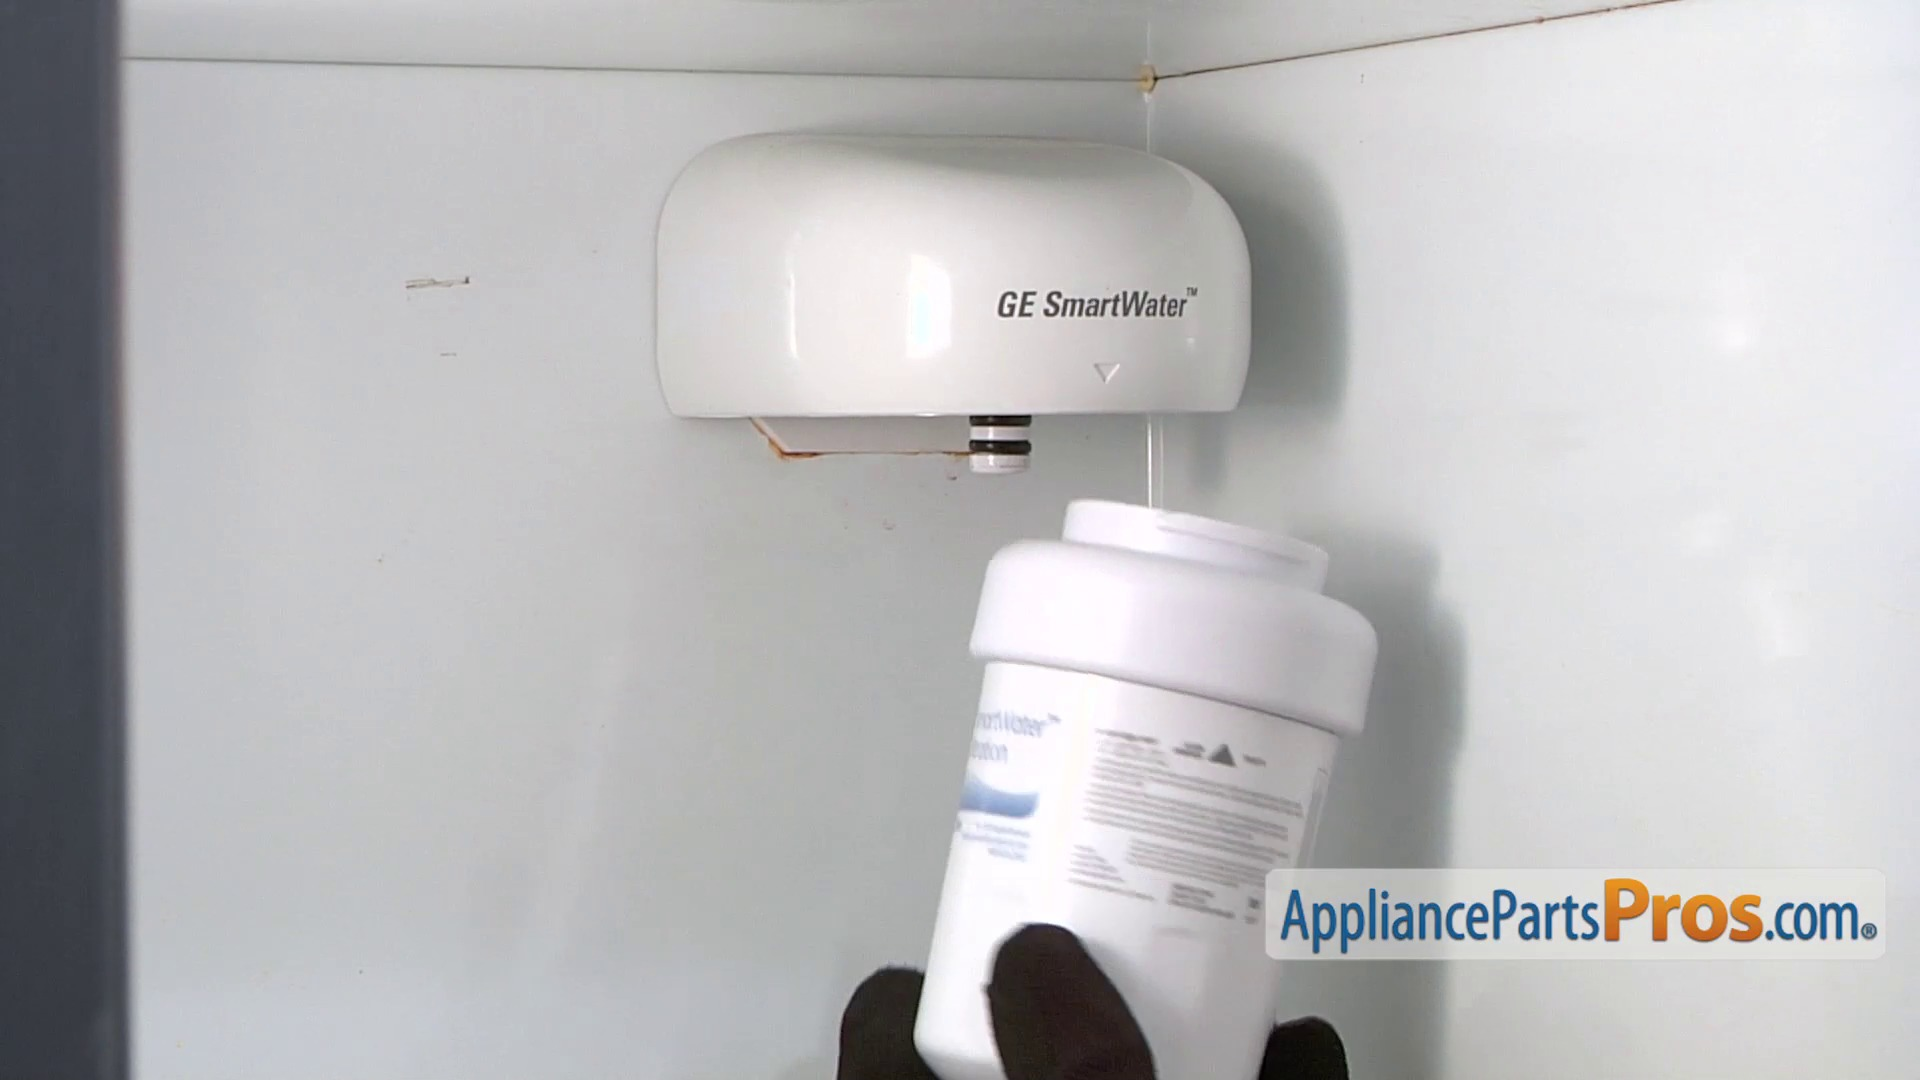 "GE MWFP GE Smartwaterâ""¢ Replacement Water Filter AppliancePartsPros"